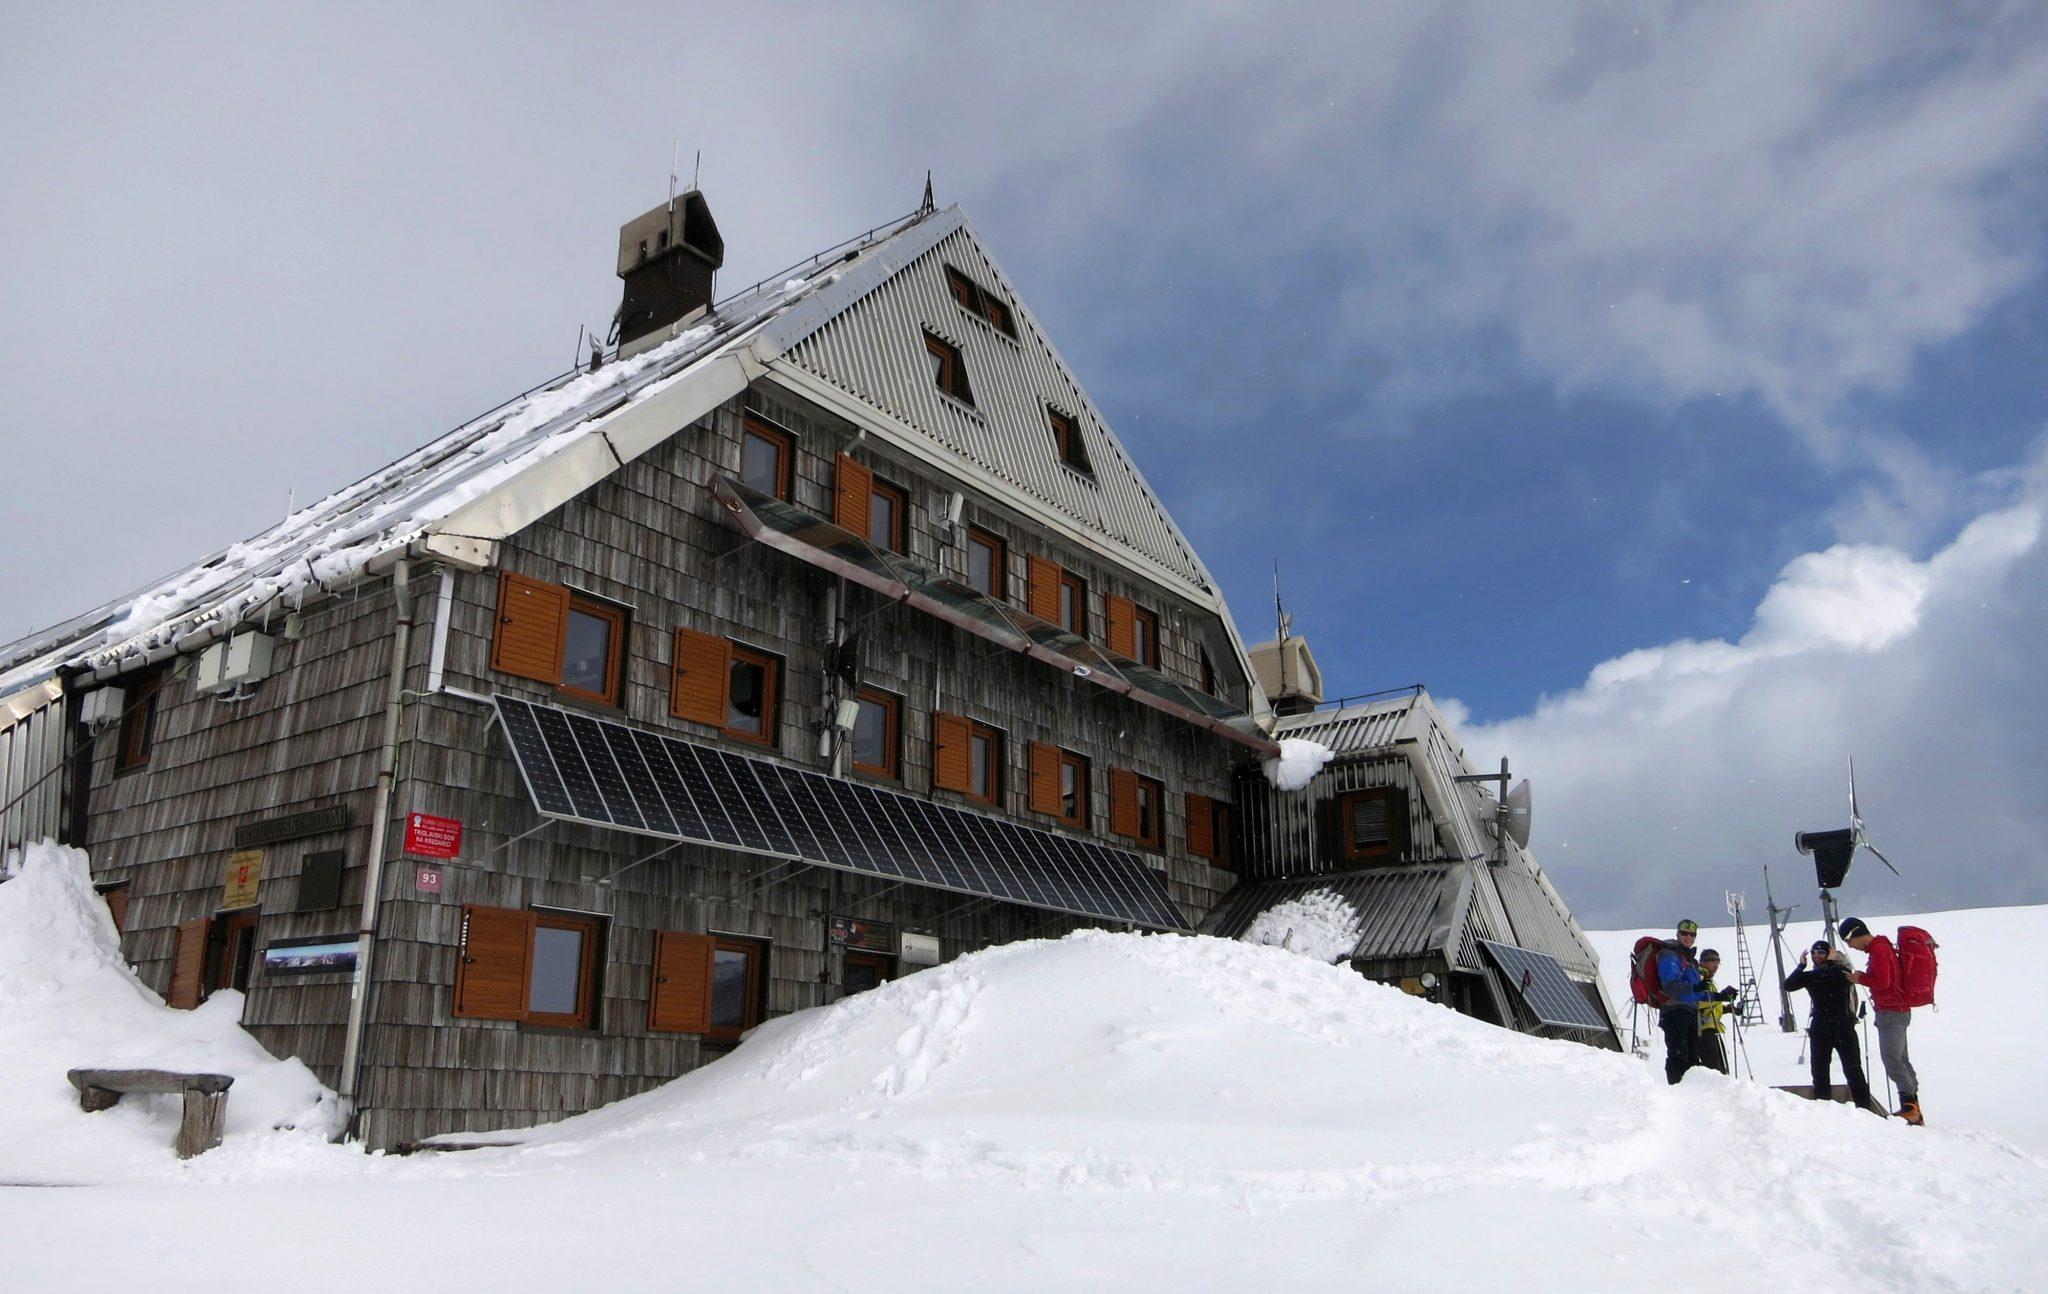 The Triglav Lodge at Kredarica.